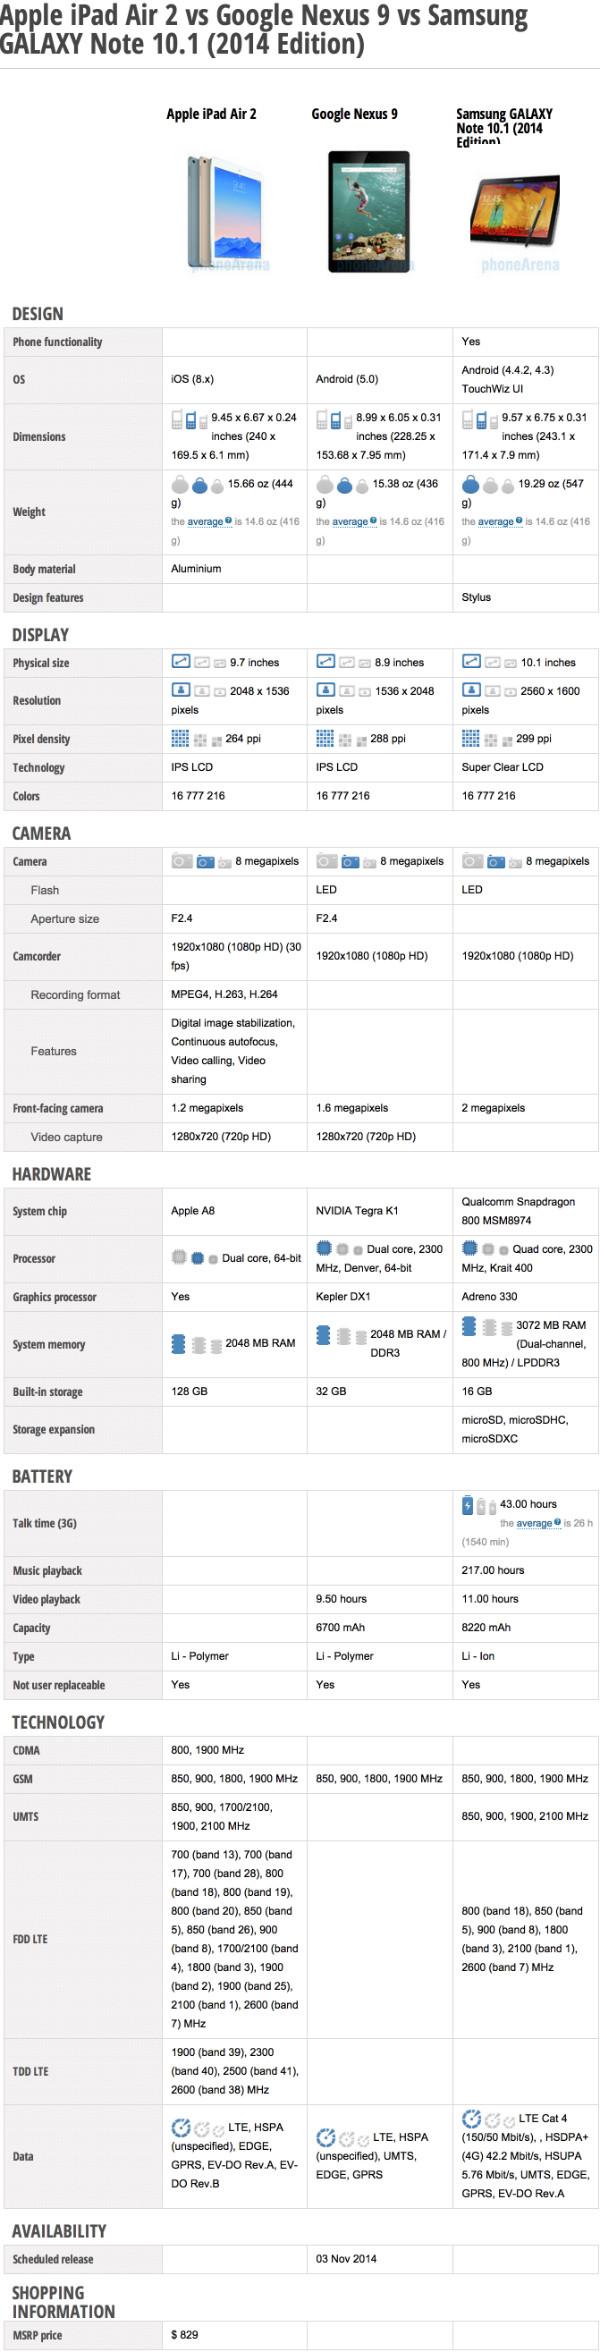 Apple iPad Air 2 vs Google Nexus 9 vs Samsung Galaxy Note 10.1 2014 edition specs comparison clash-w600